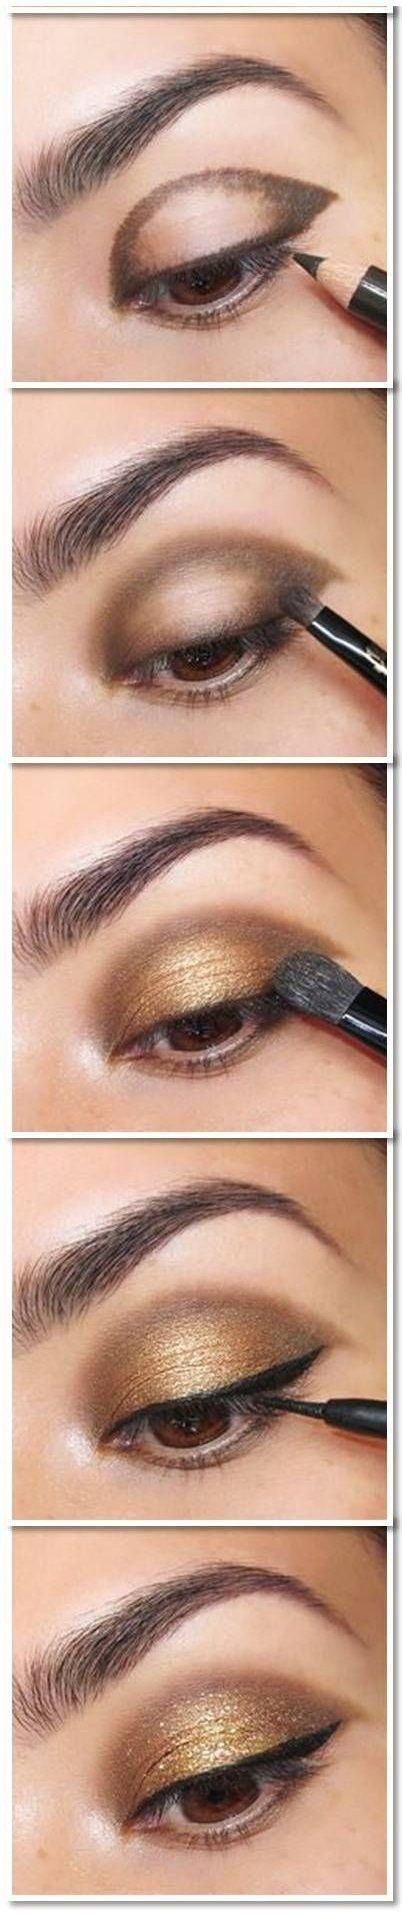 Simple Maquillage Tutoriel d'or des yeux работа, девушка, рубеж, австралия, турция, сша, америка, граница http://escort-journal.com/